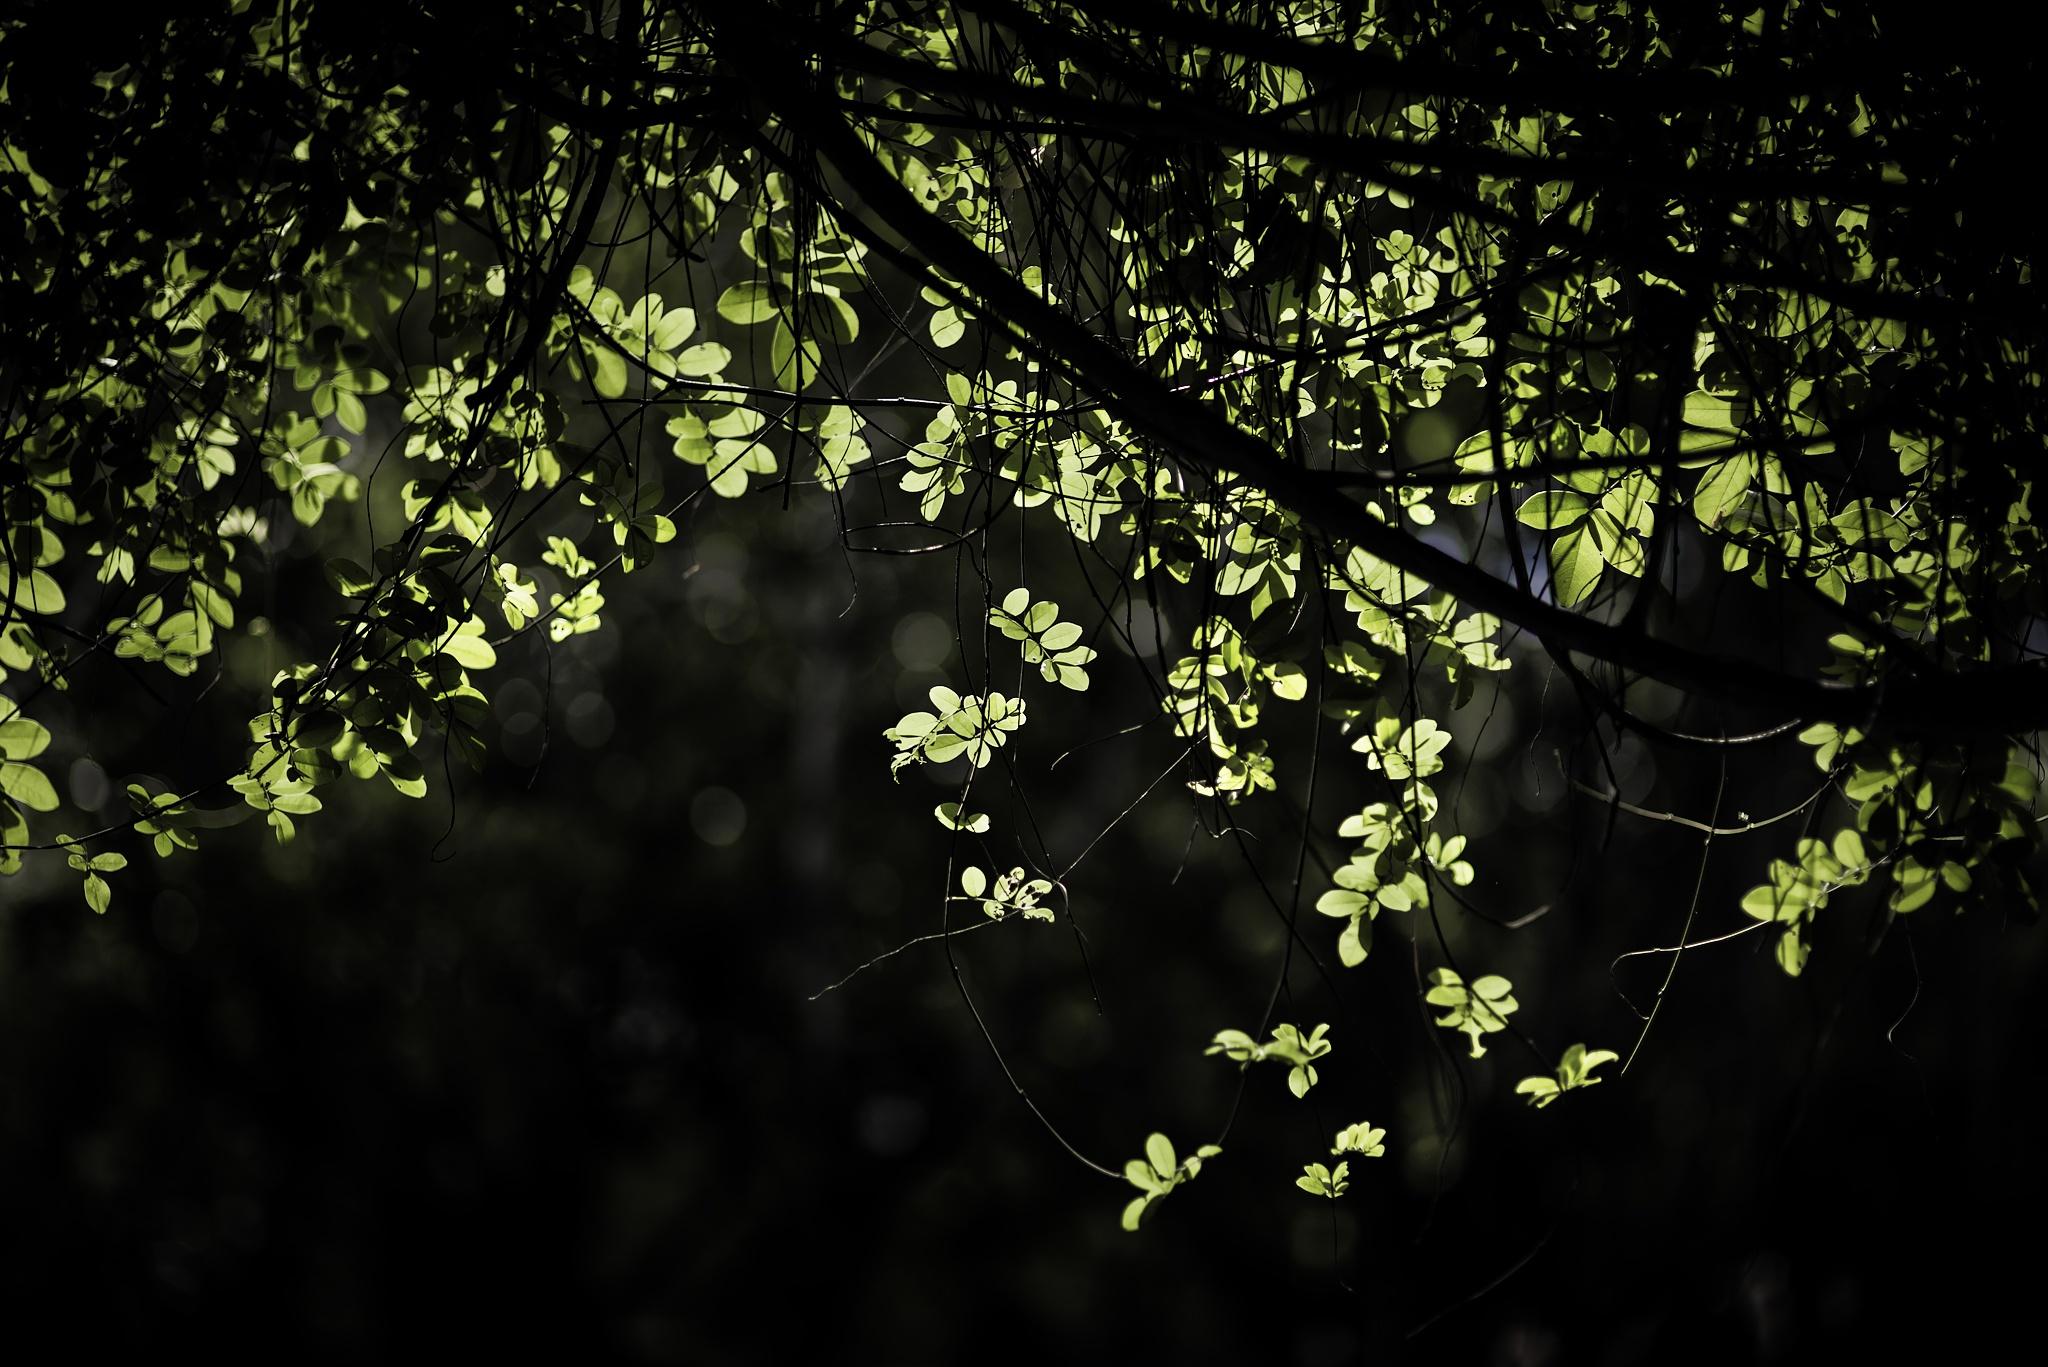 green leaf by iloveubon